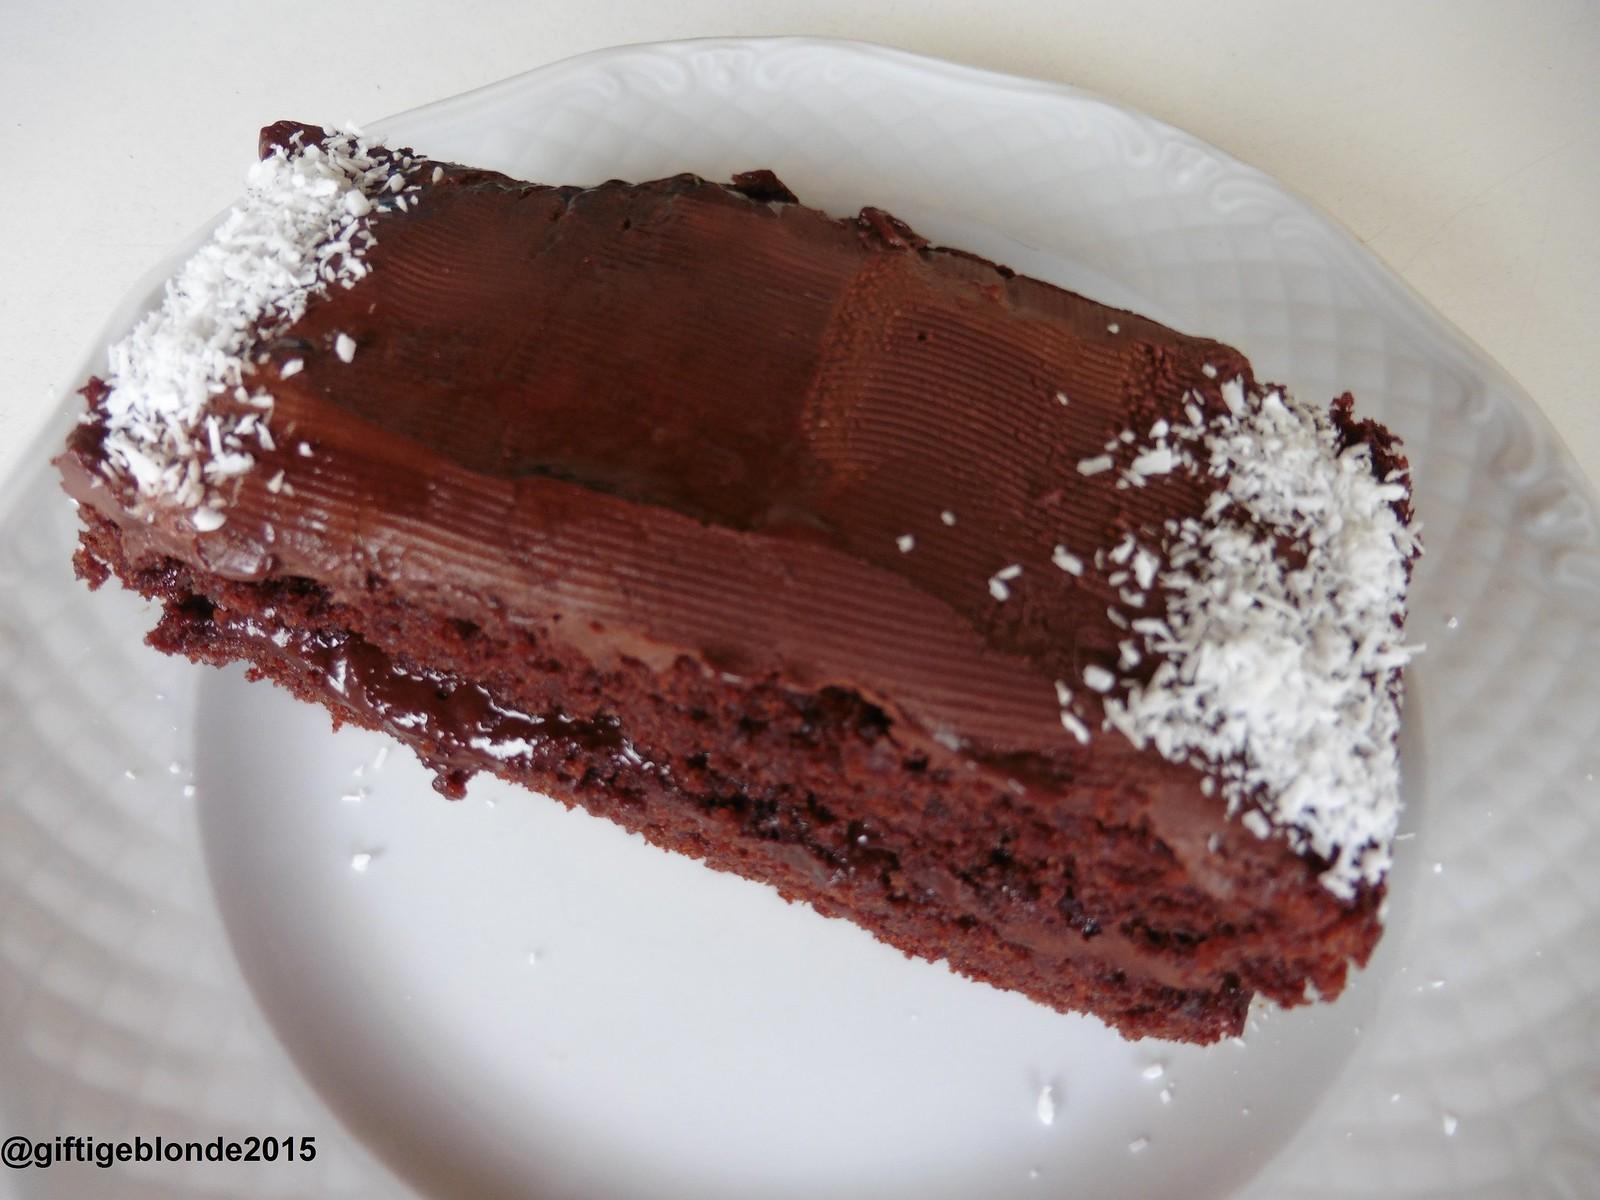 Schokoladekuchen ala Sacher